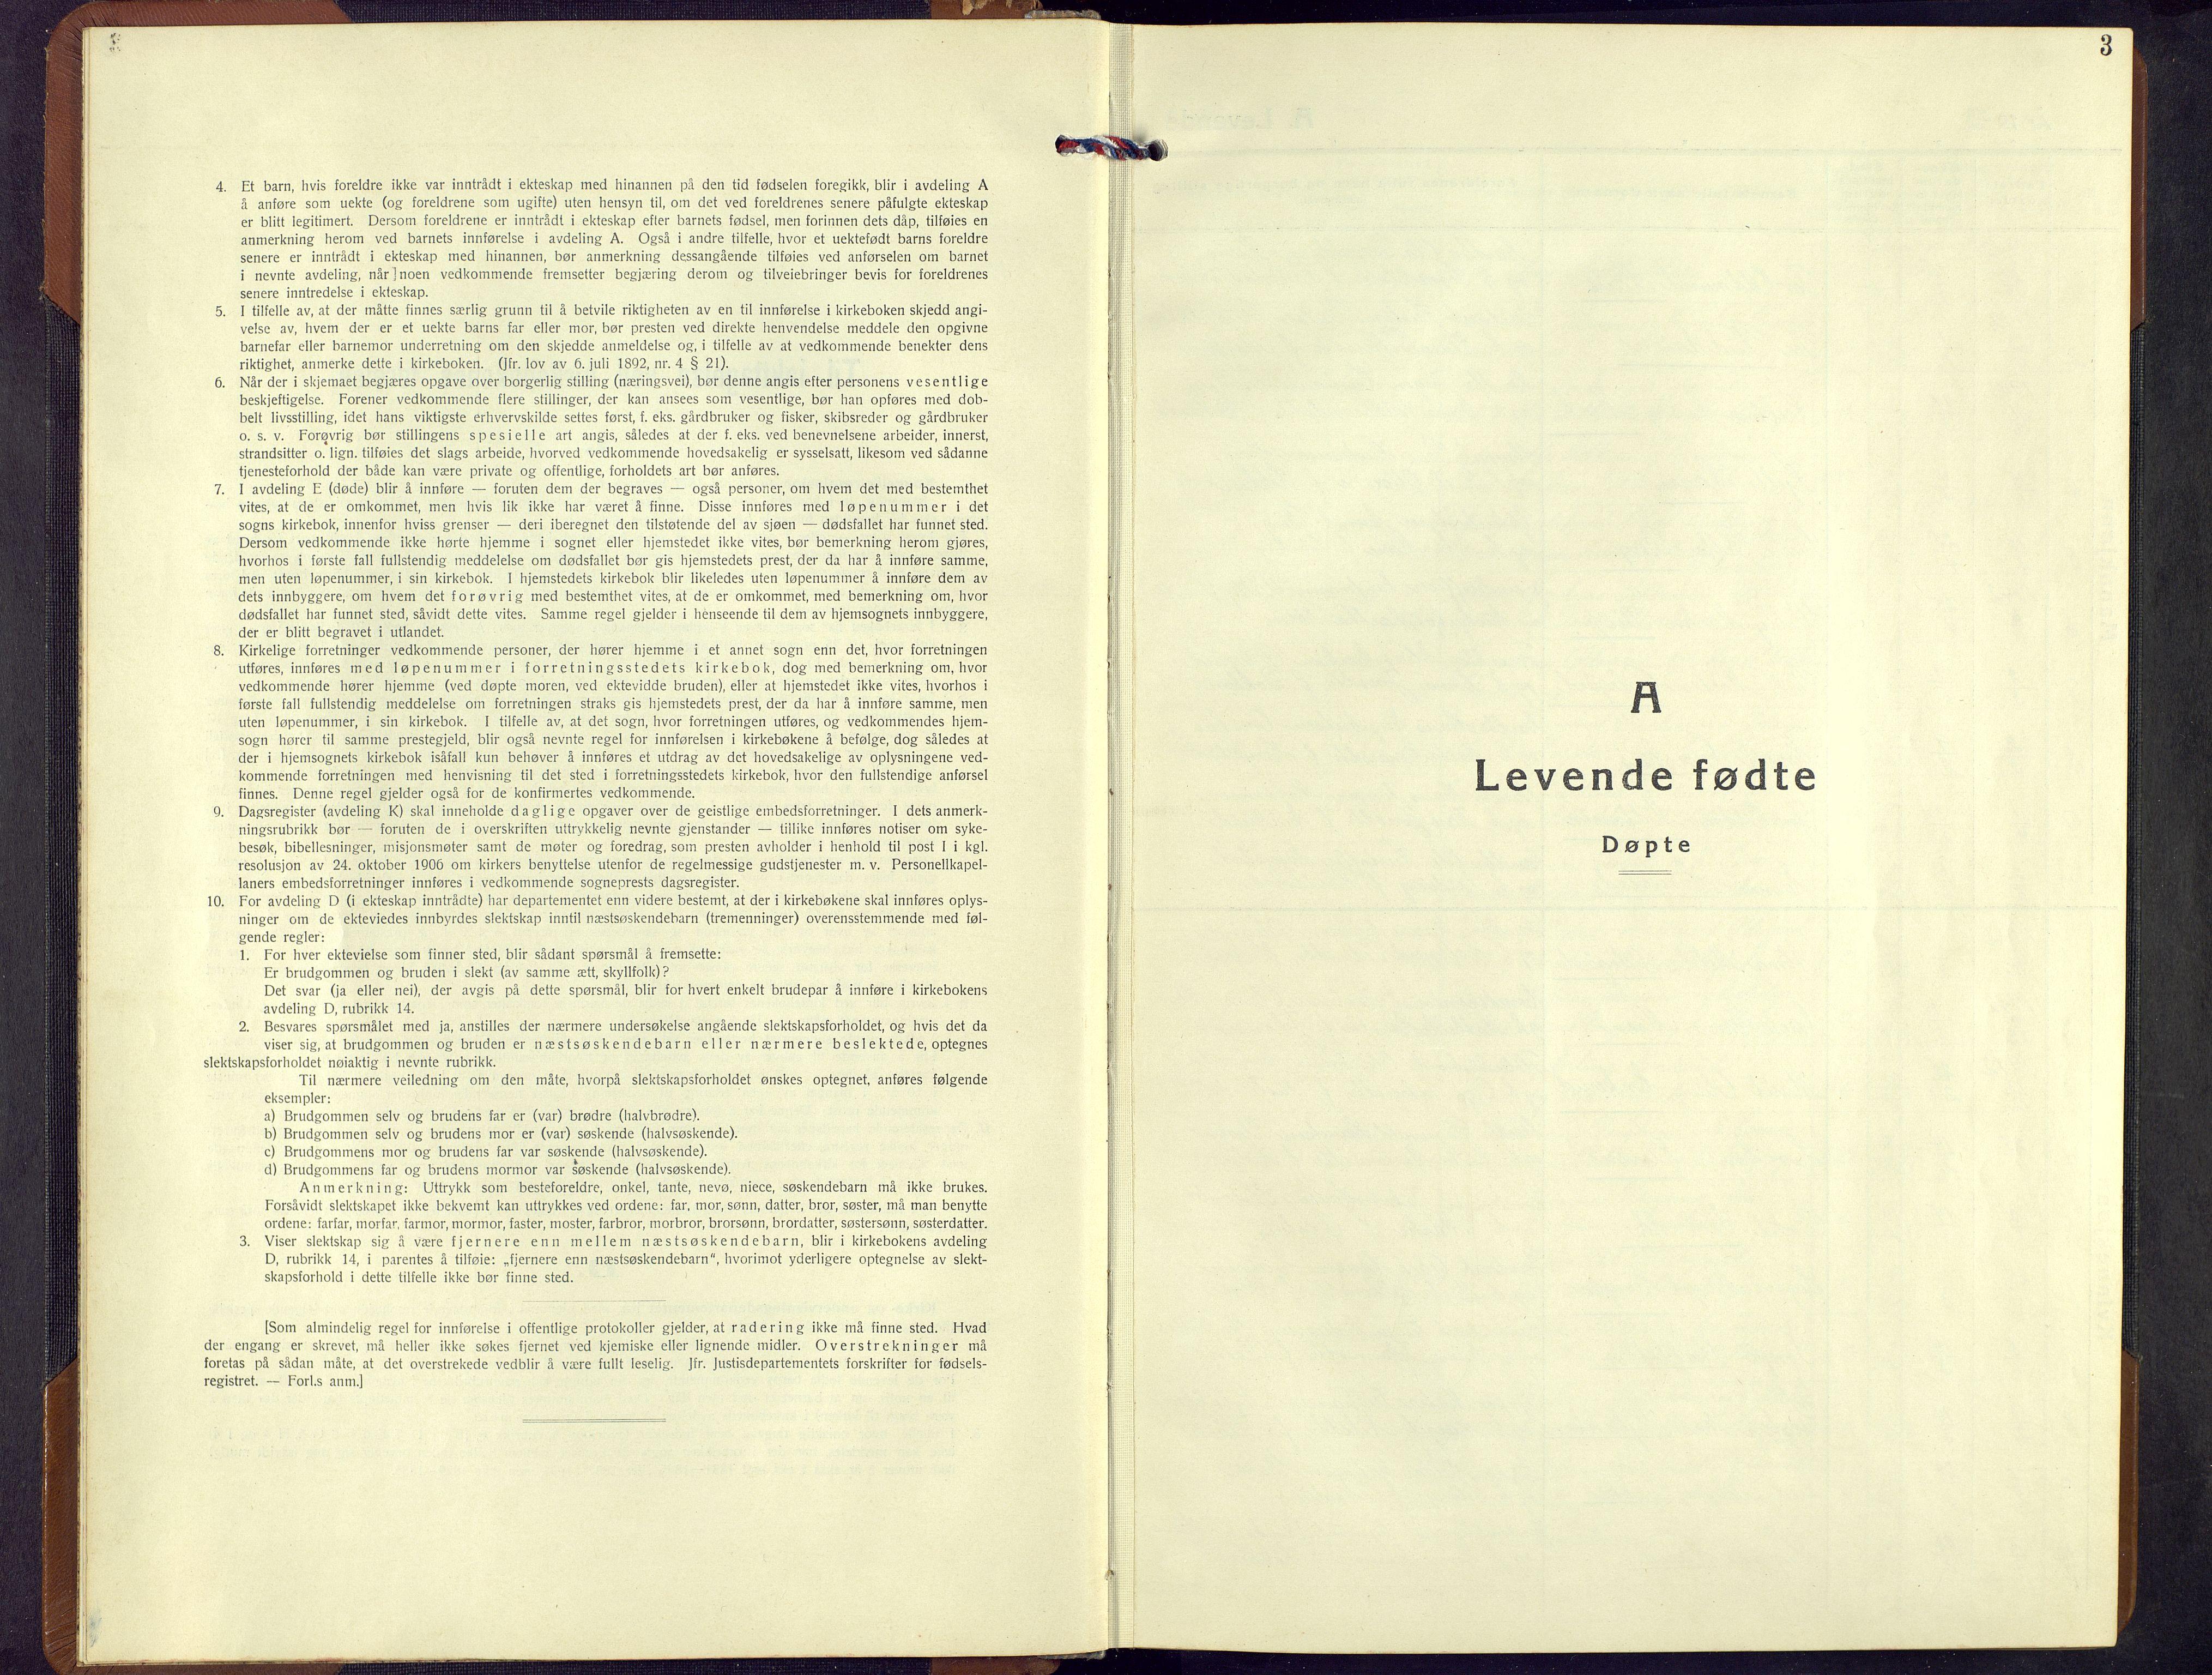 SAH, Ringebu prestekontor, Klokkerbok nr. 13, 1943-1956, s. 3